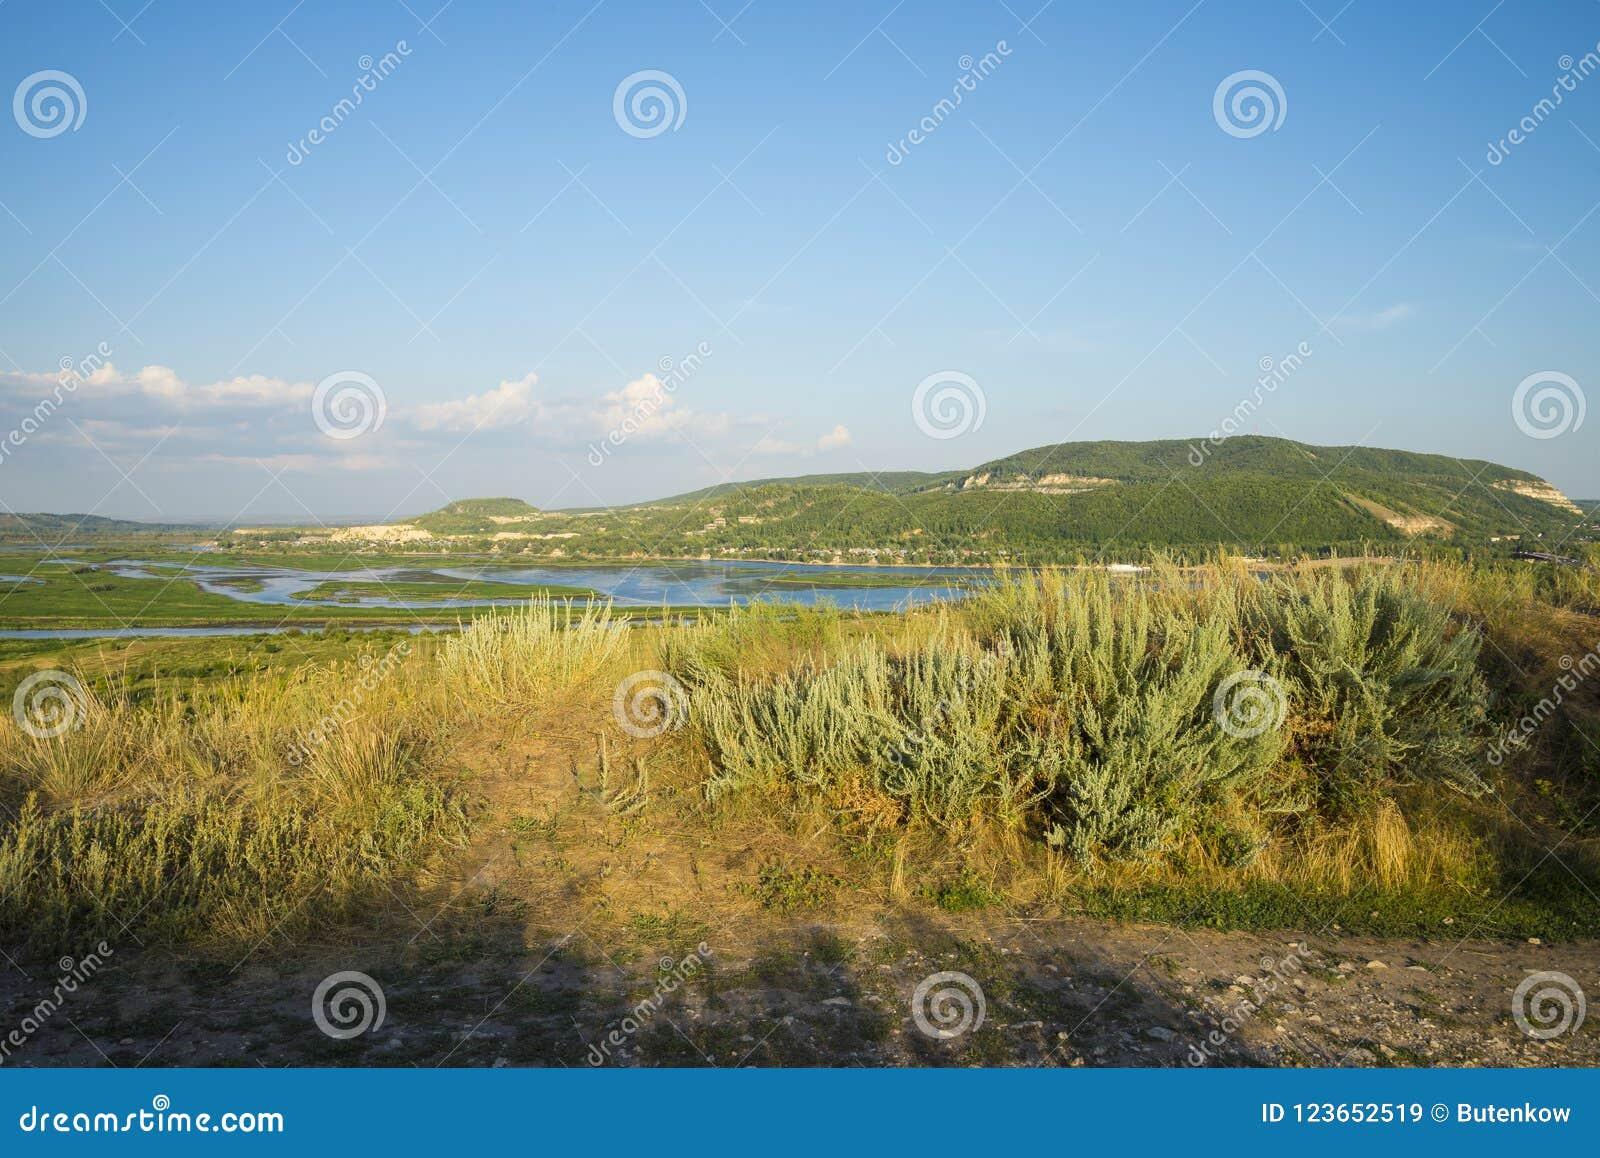 Tsarev Kurgan, Samara: description, location and interesting facts 36